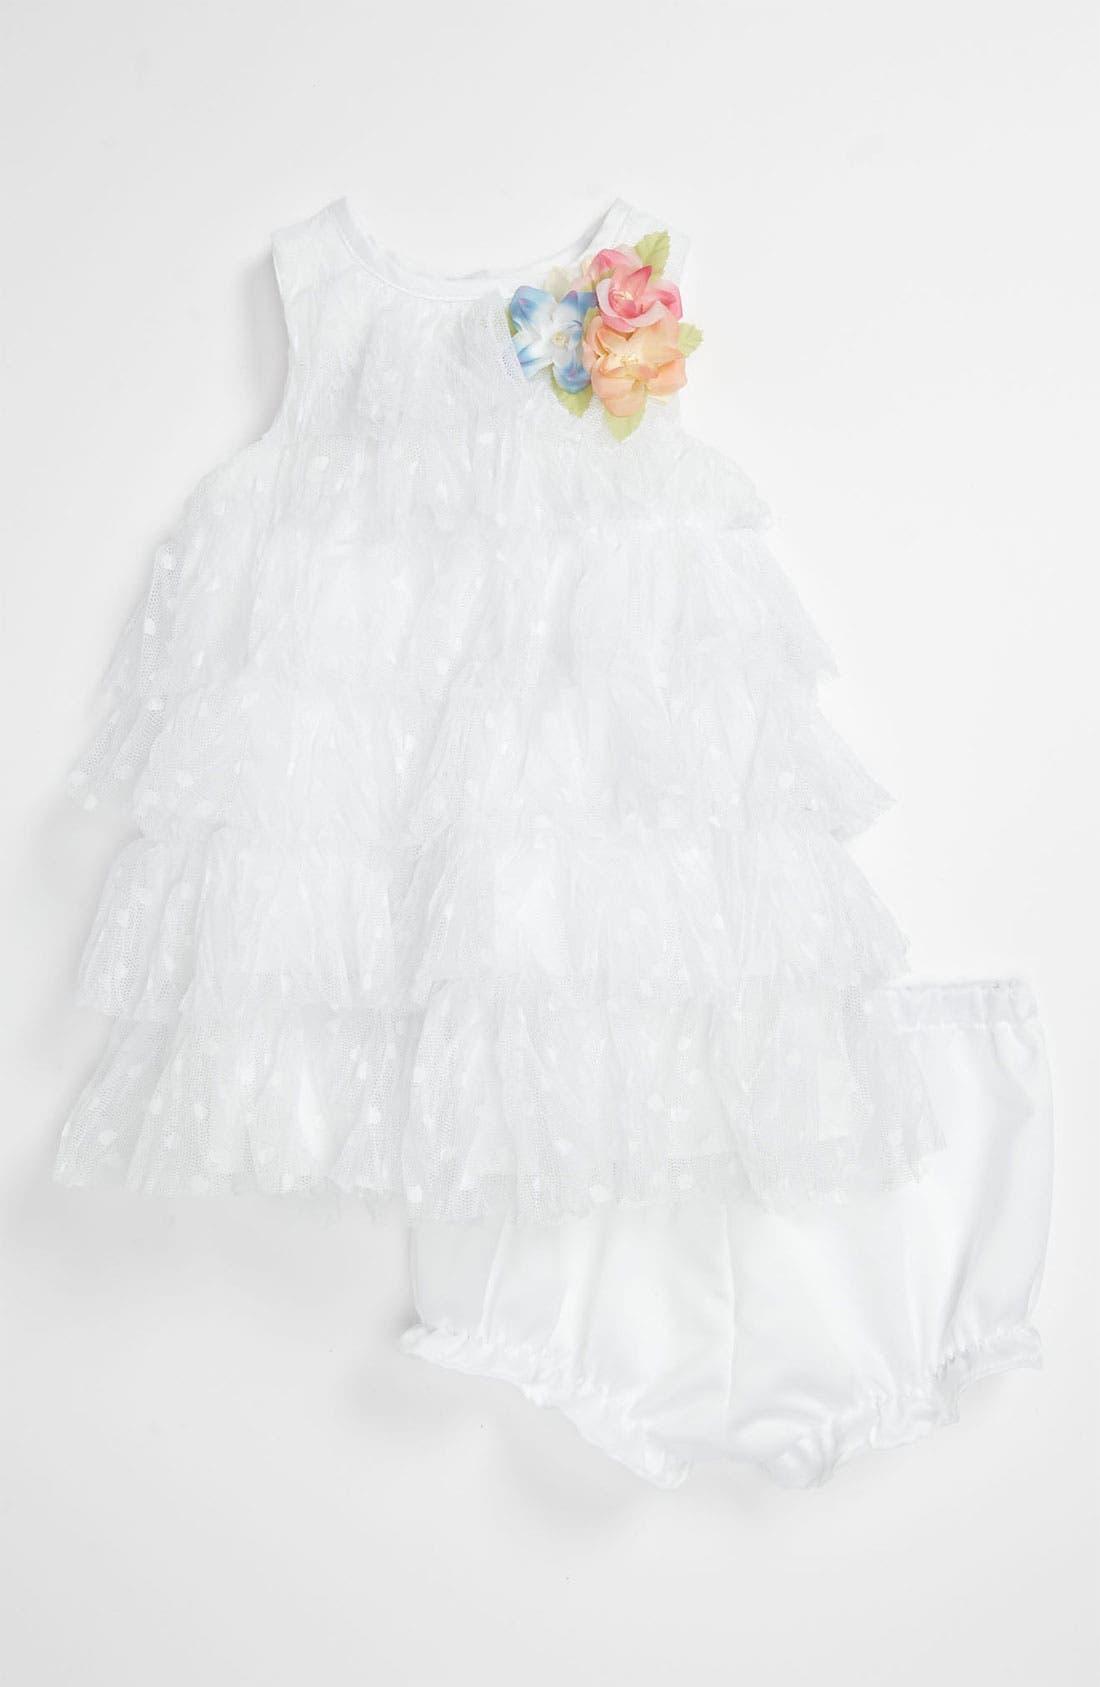 Main Image - Laura Ashley 'Point Esprit' Tier Dress (Baby Girls)